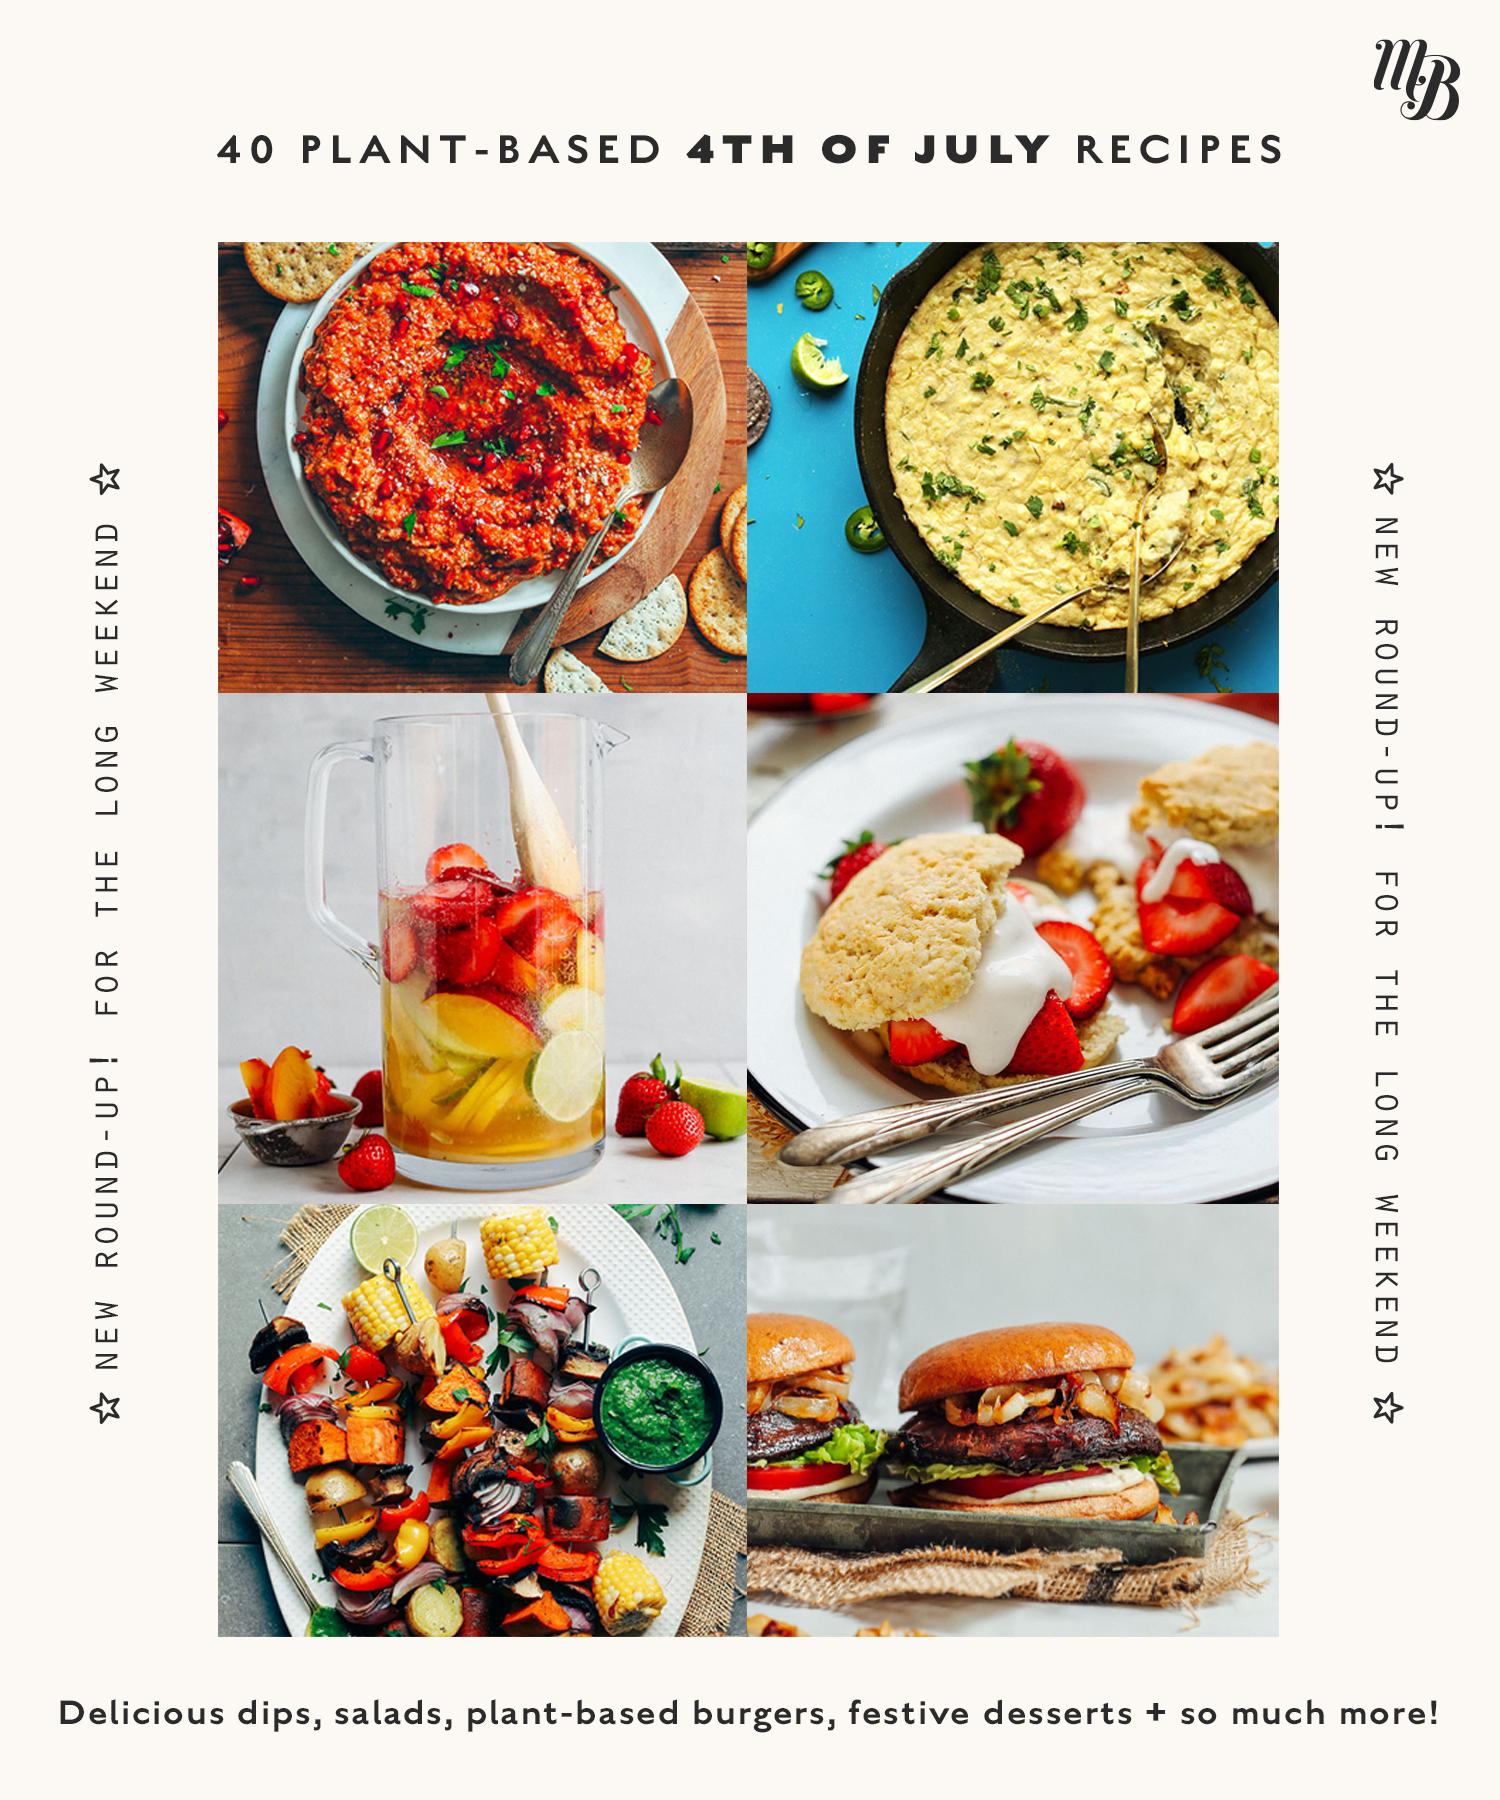 Assortment of vegan 4th of July recipes